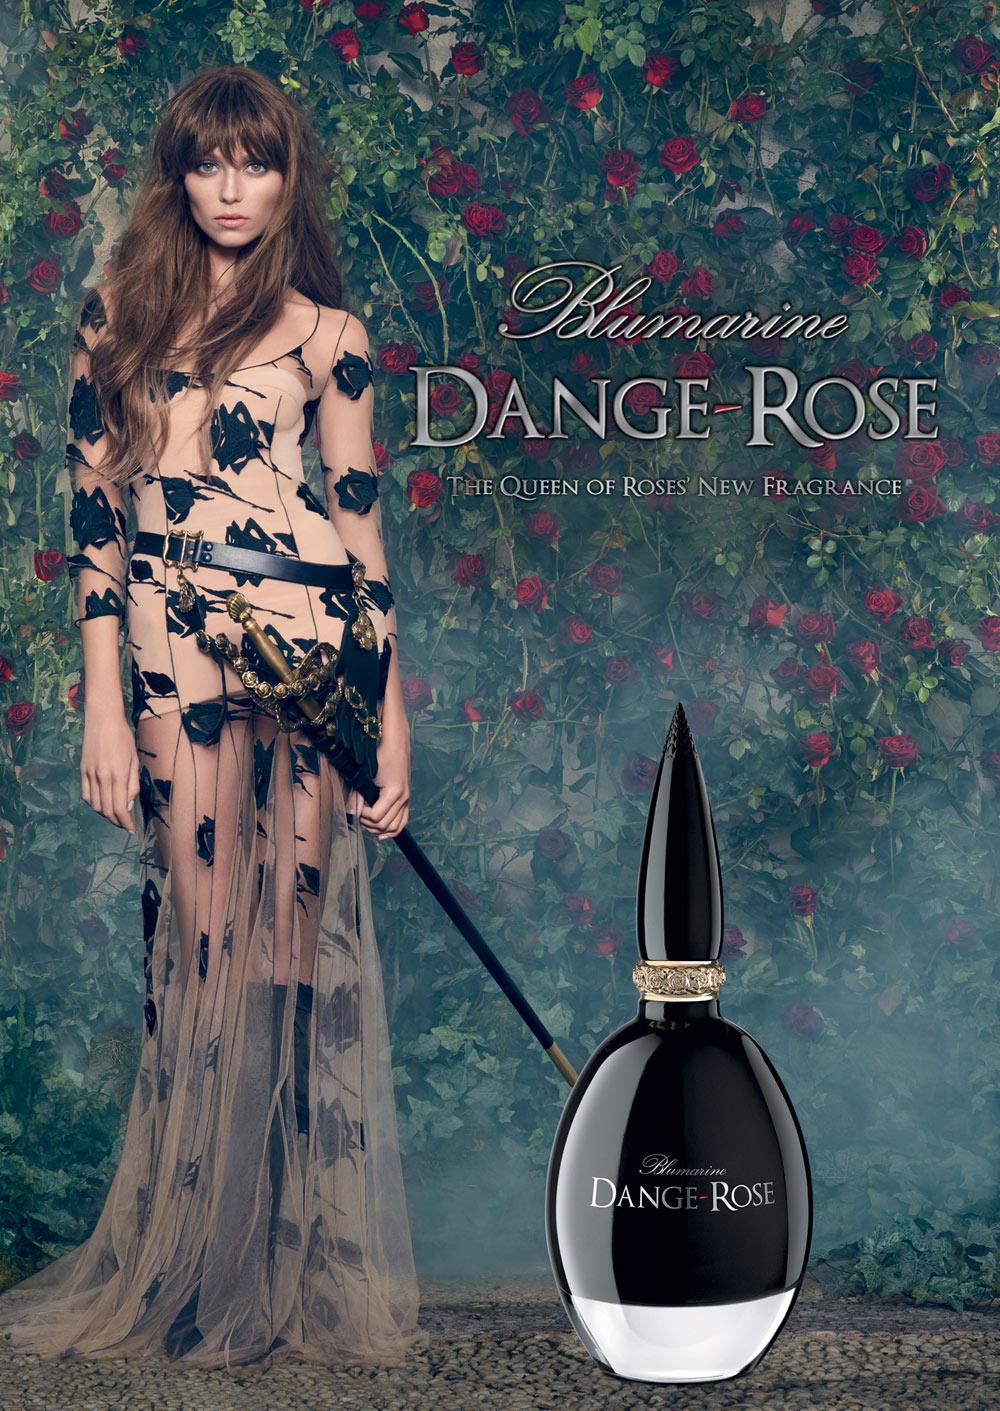 Blumarine - Blumarine Dange-Rose New Fragrances